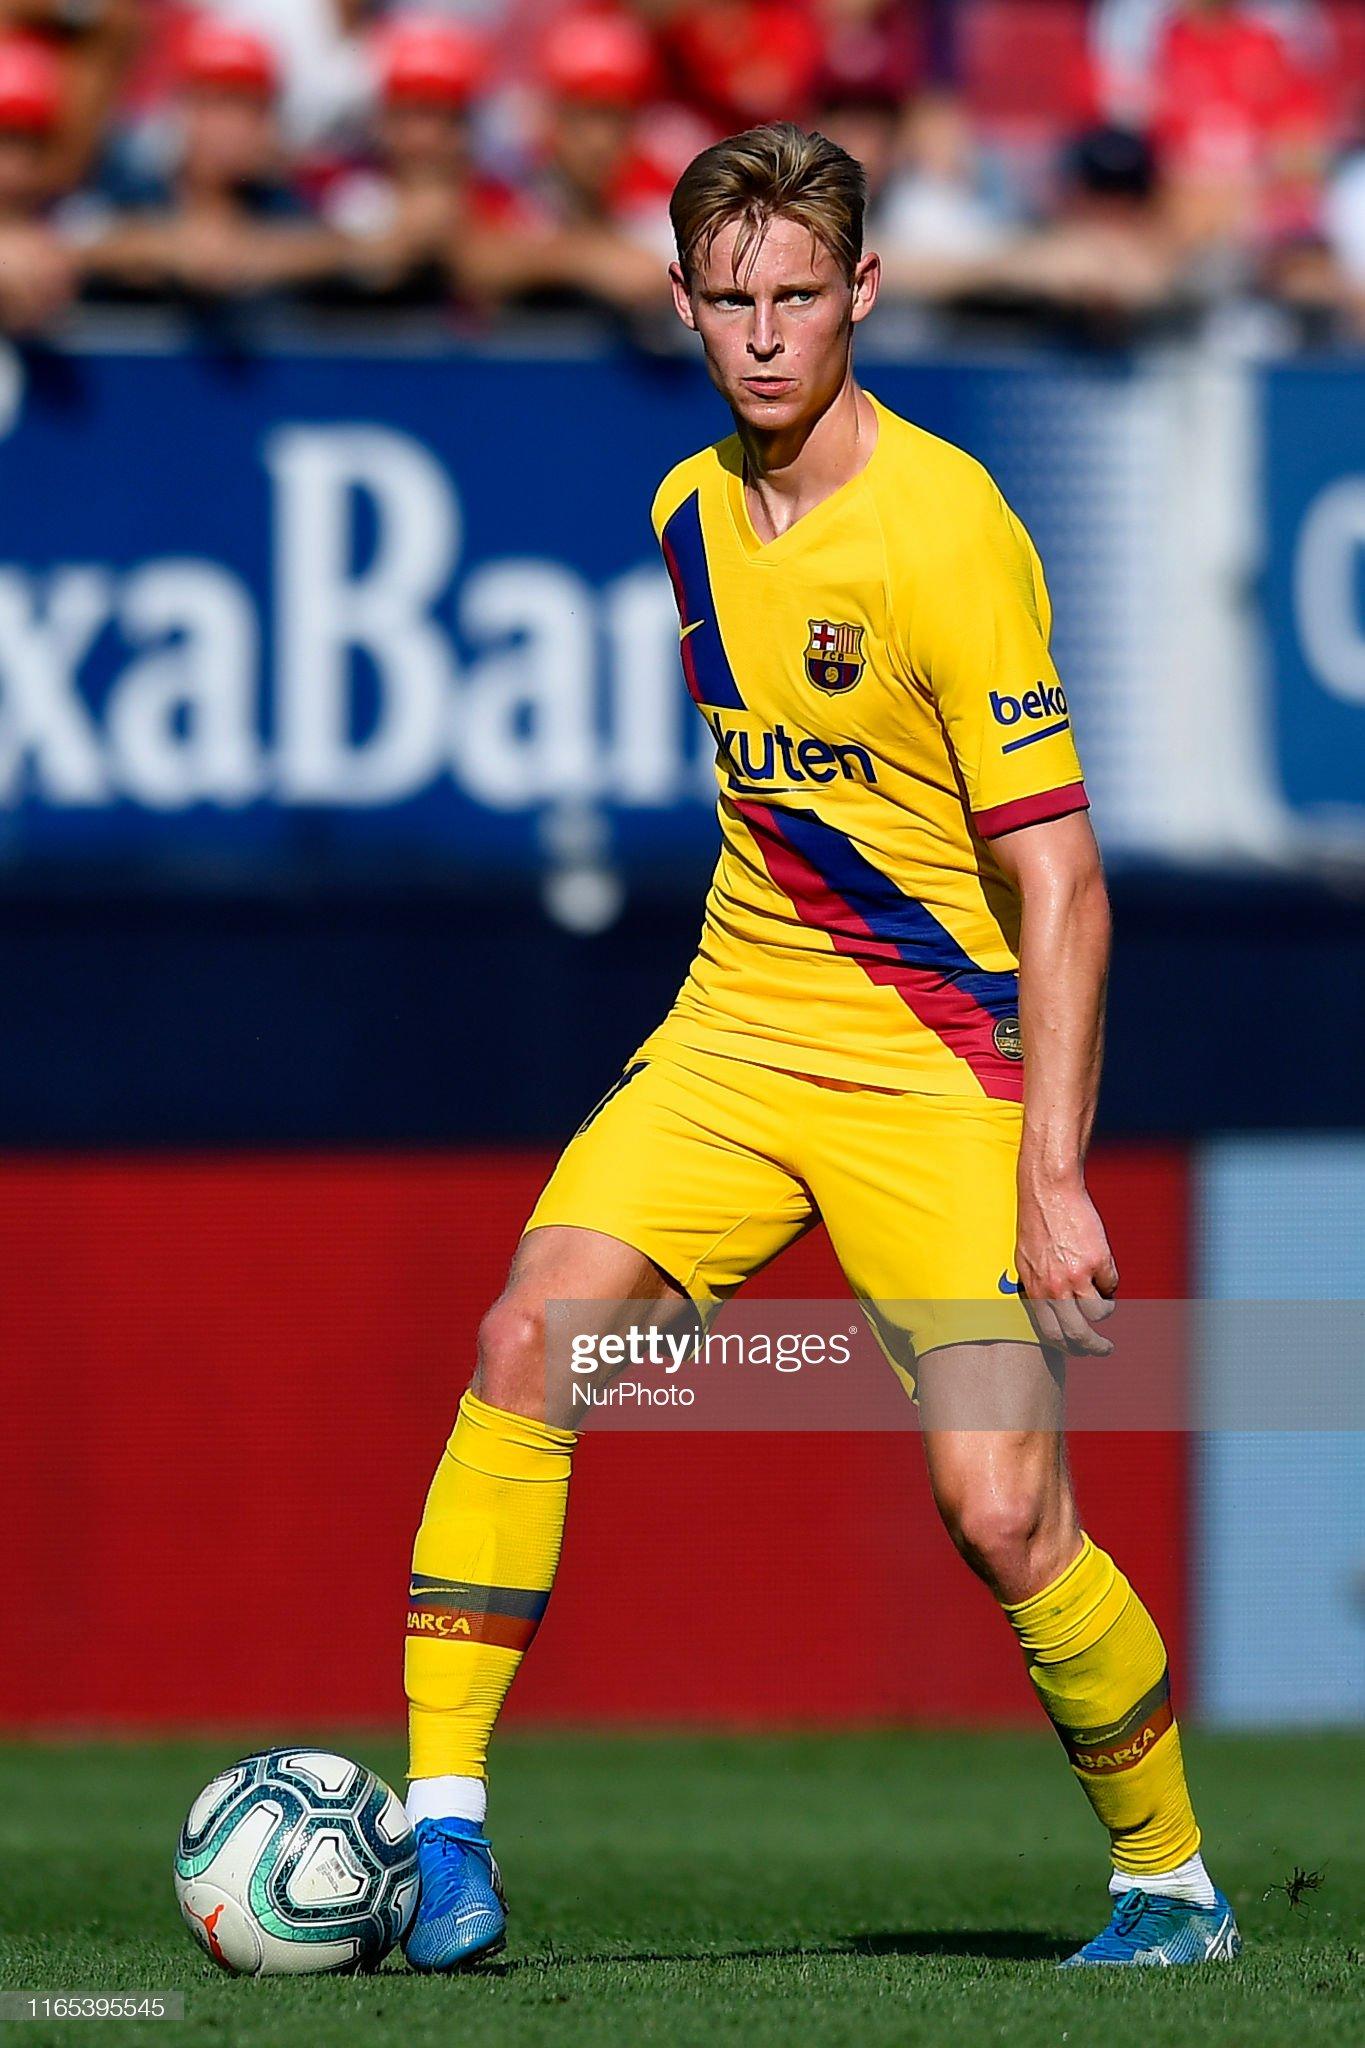 صور مباراة : أوساسونا - برشلونة 2-2 ( 31-08-2019 )  Frenkie-de-jong-of-barcelona-in-action-during-the-liga-match-between-picture-id1165395545?s=2048x2048